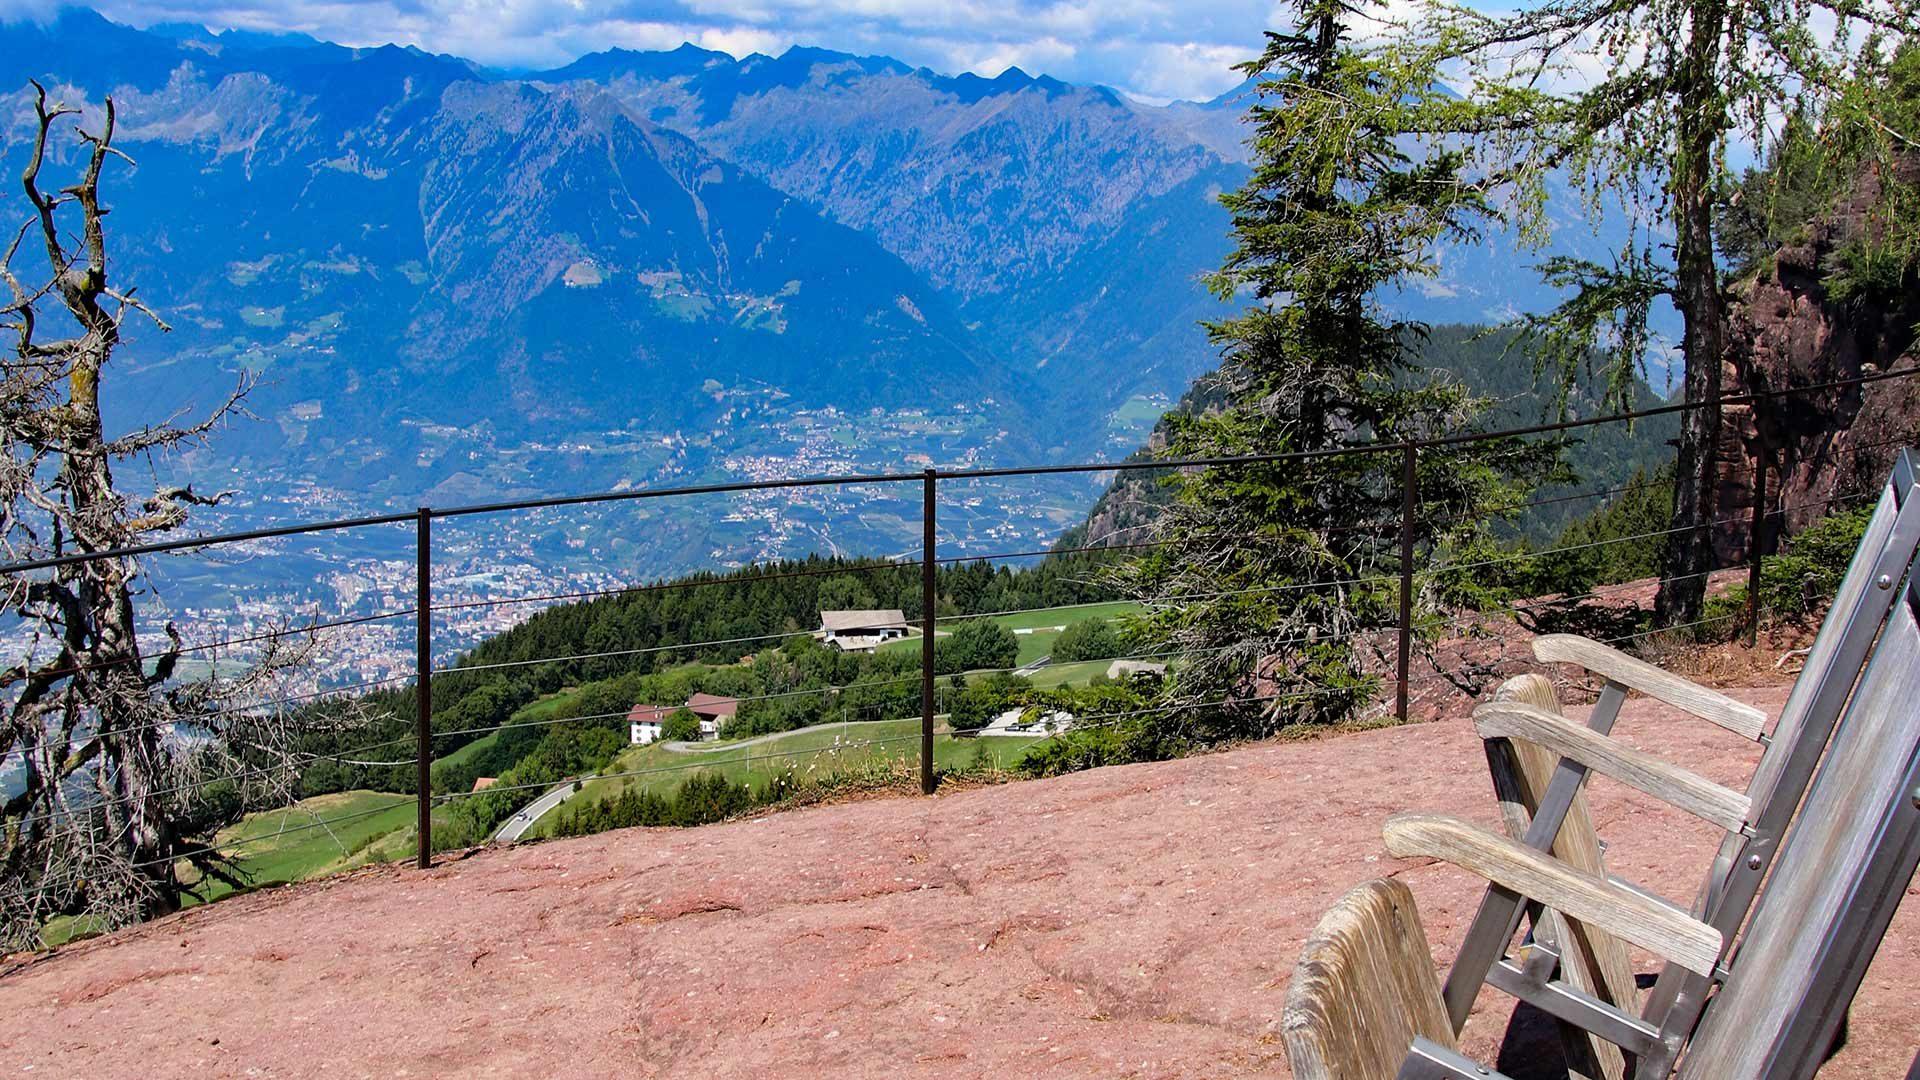 Knottnkino in Alto Adige